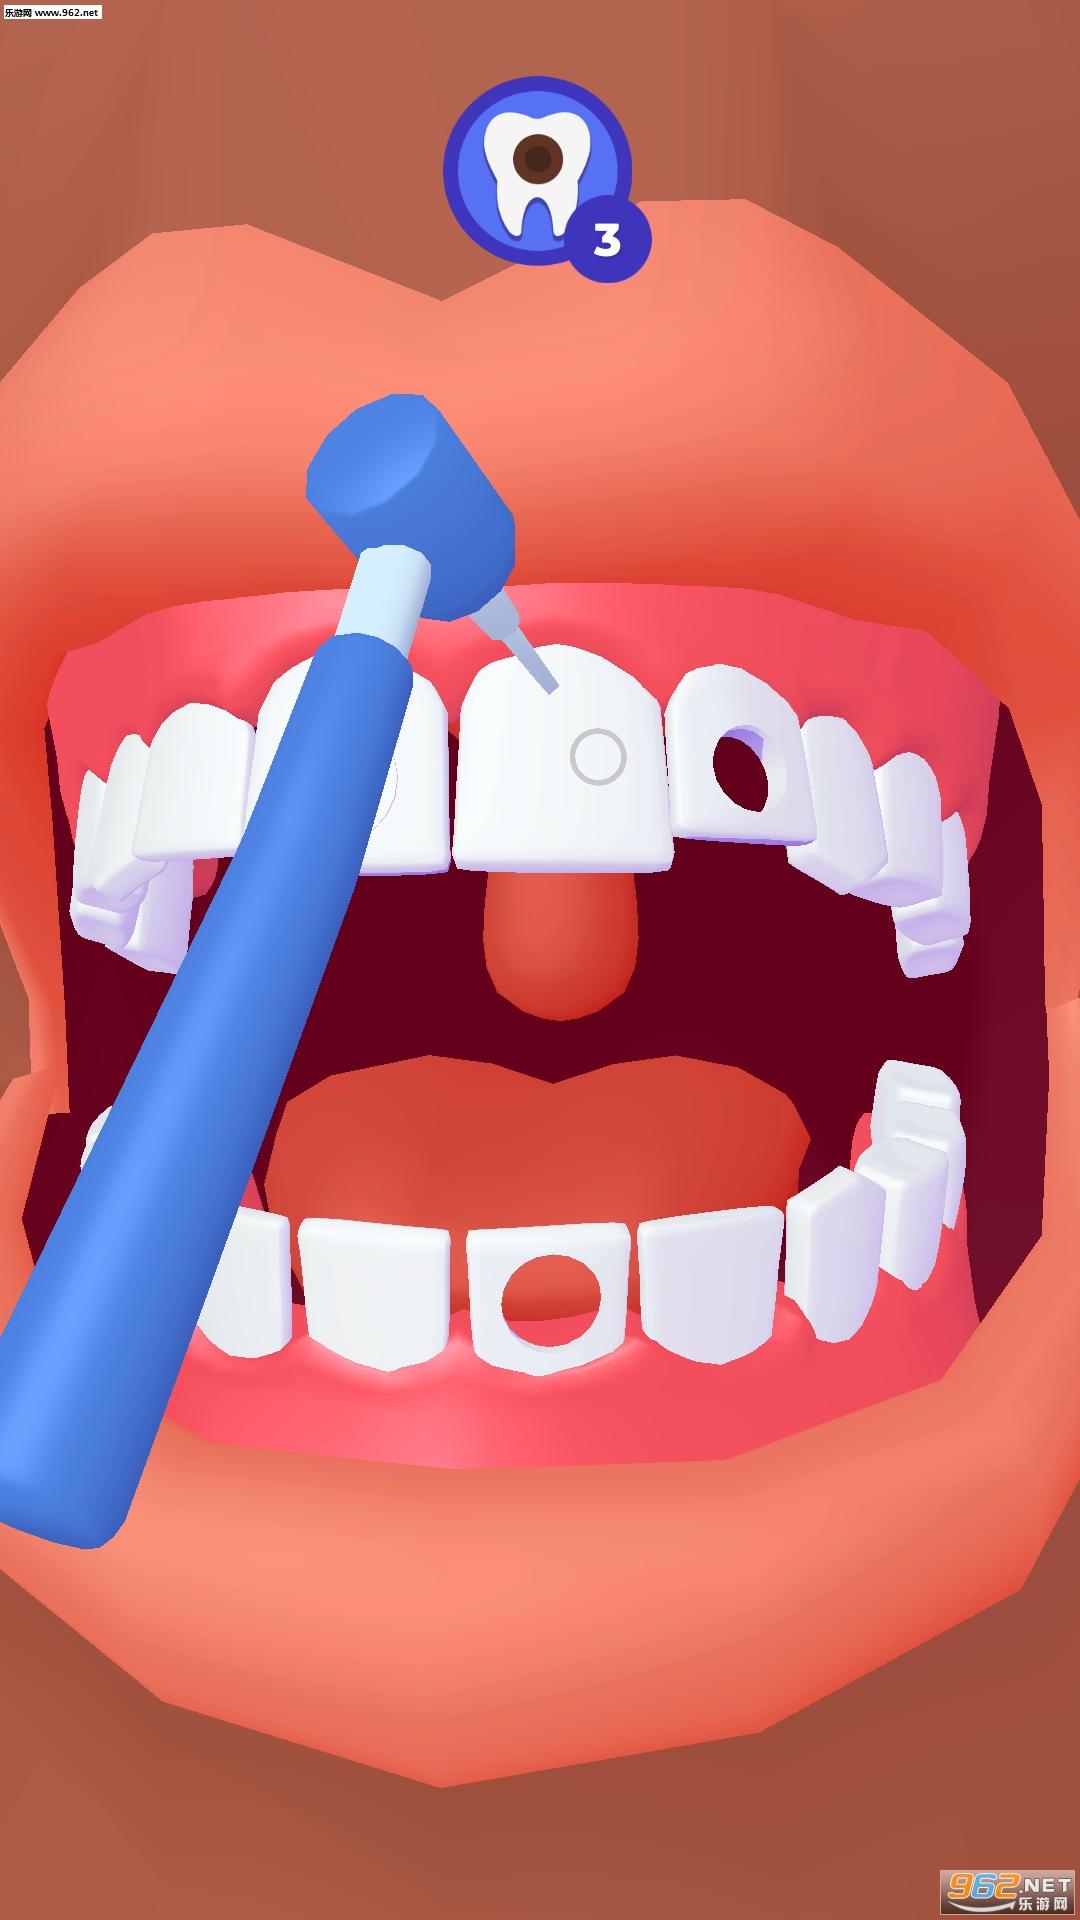 Mr Tooth安卓版v0.1.1截图0